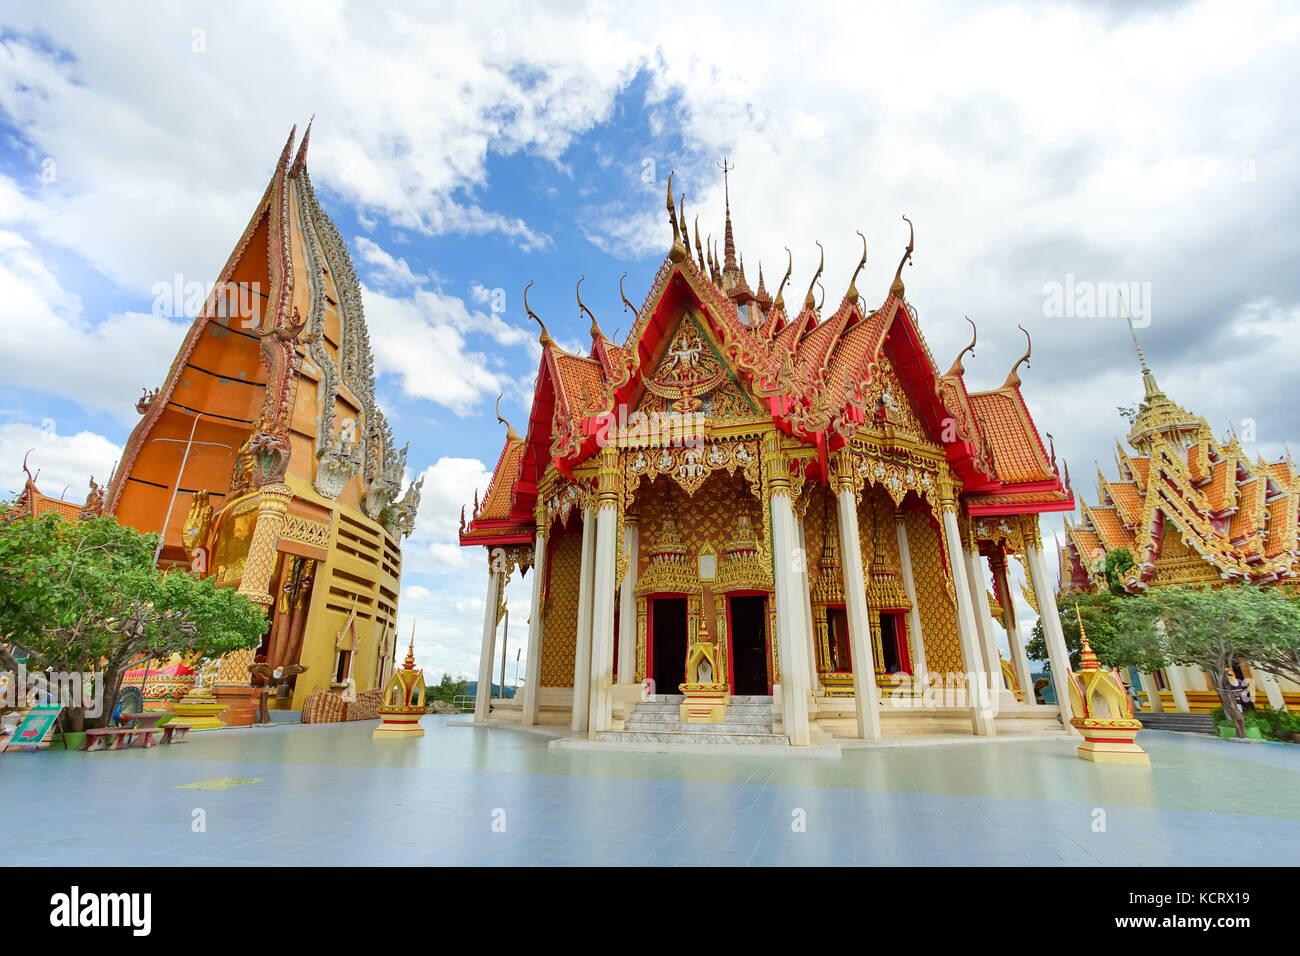 Wat Tham Sua is the most beautiful temple in Kanchanaburi, Thailand - Stock Image